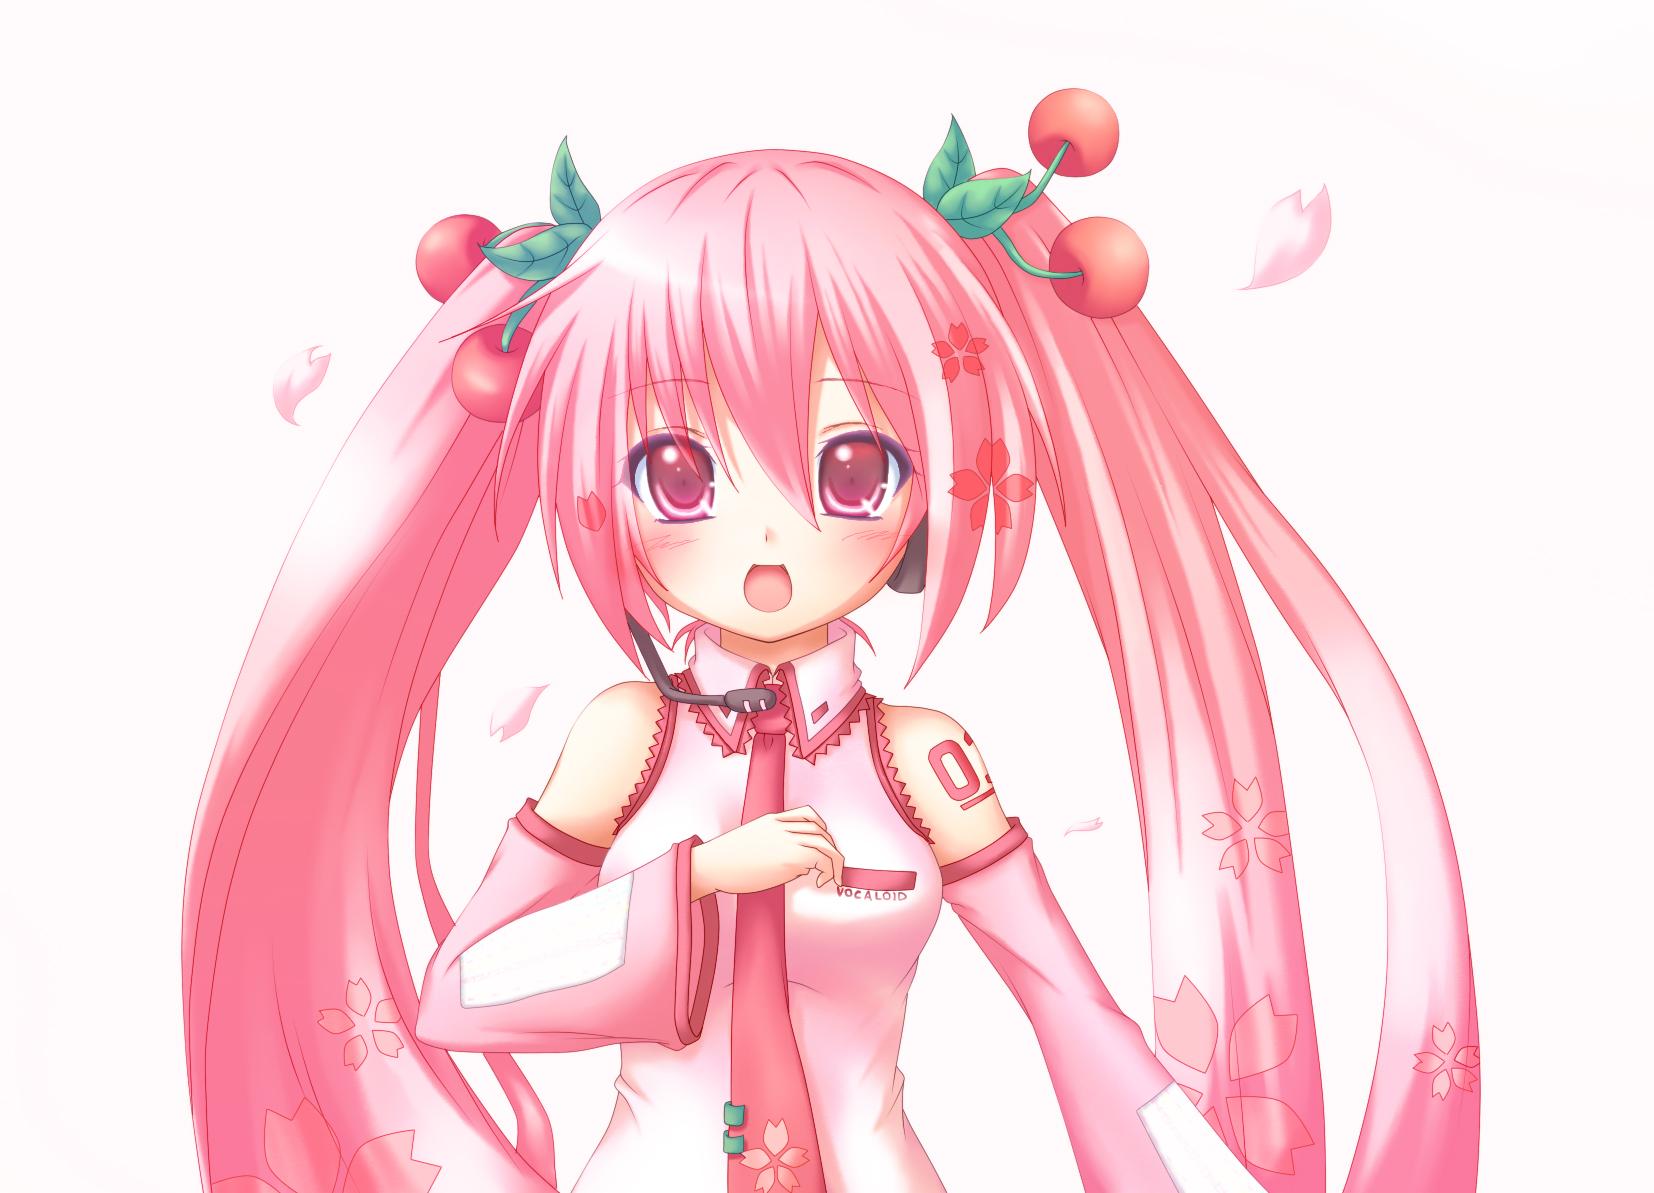 Hatsune Miku - VOCALOID - Image #1100437 - Zerochan Anime ...